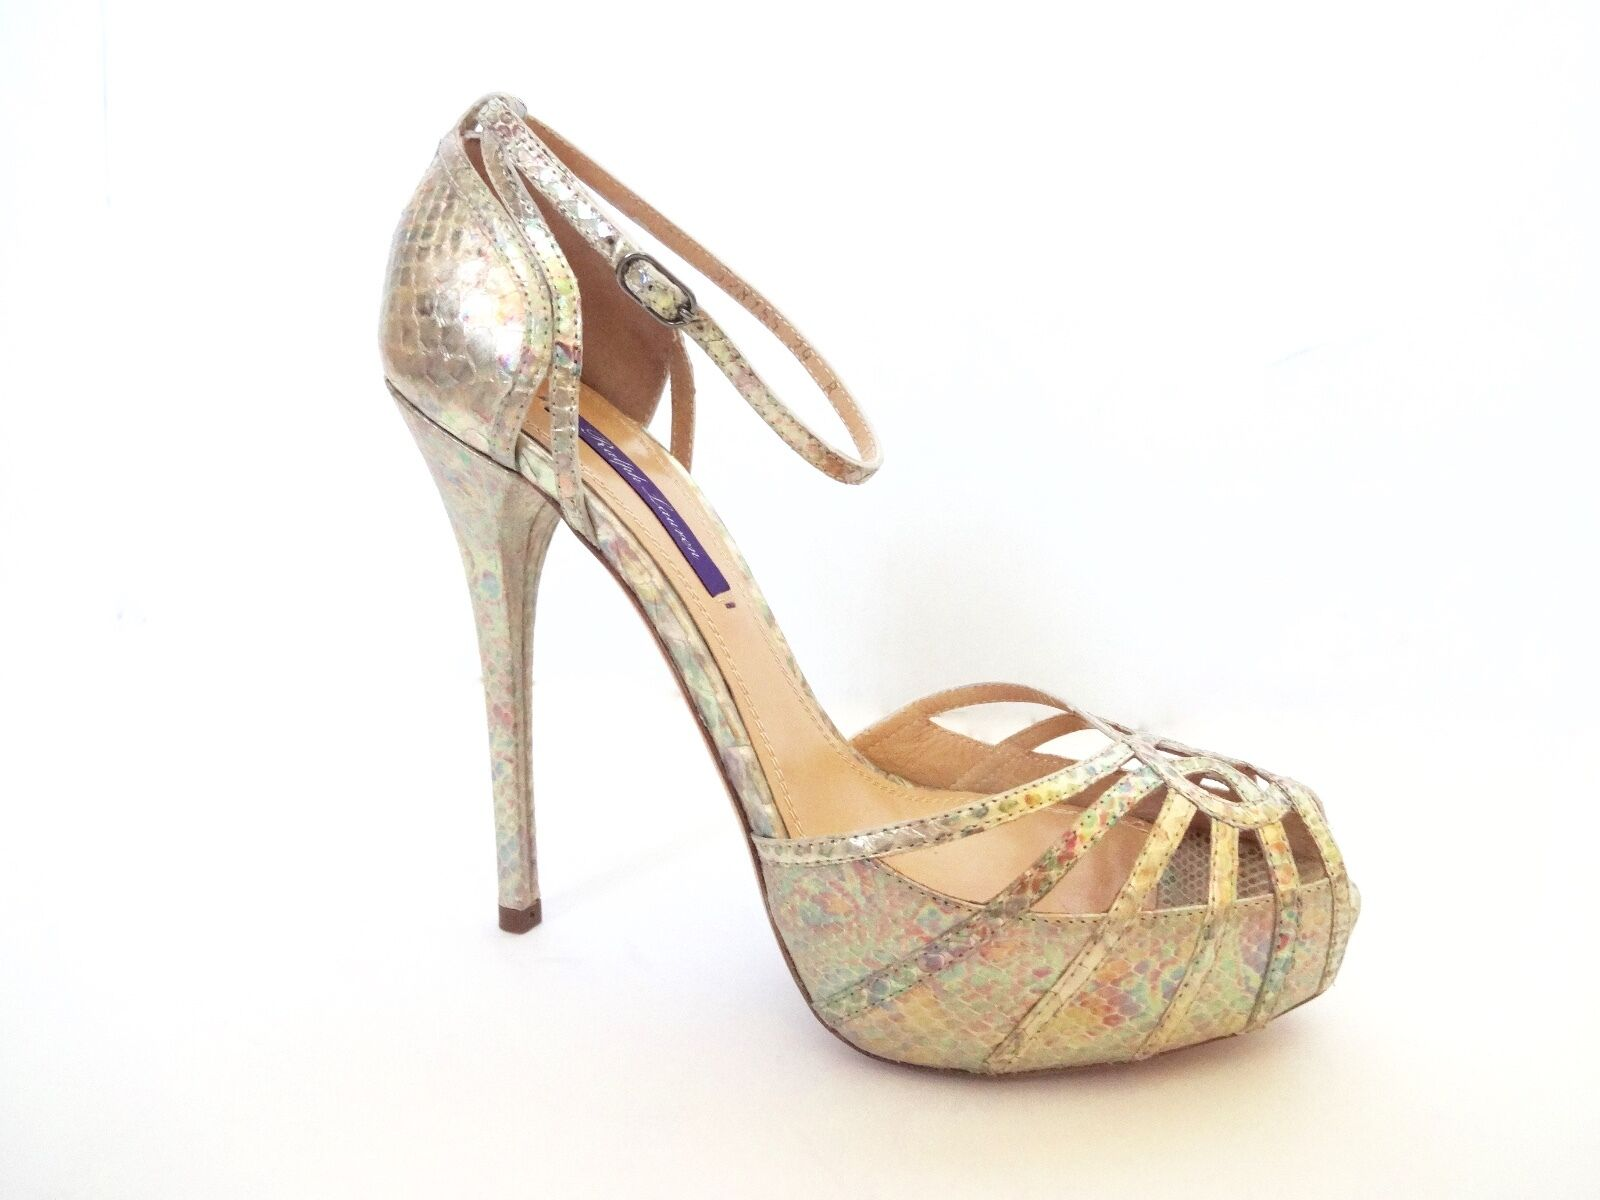 Nw Ralph Lauren Purple Label Collection Jearra Pearl Python Sandals Shoes 39.5 B